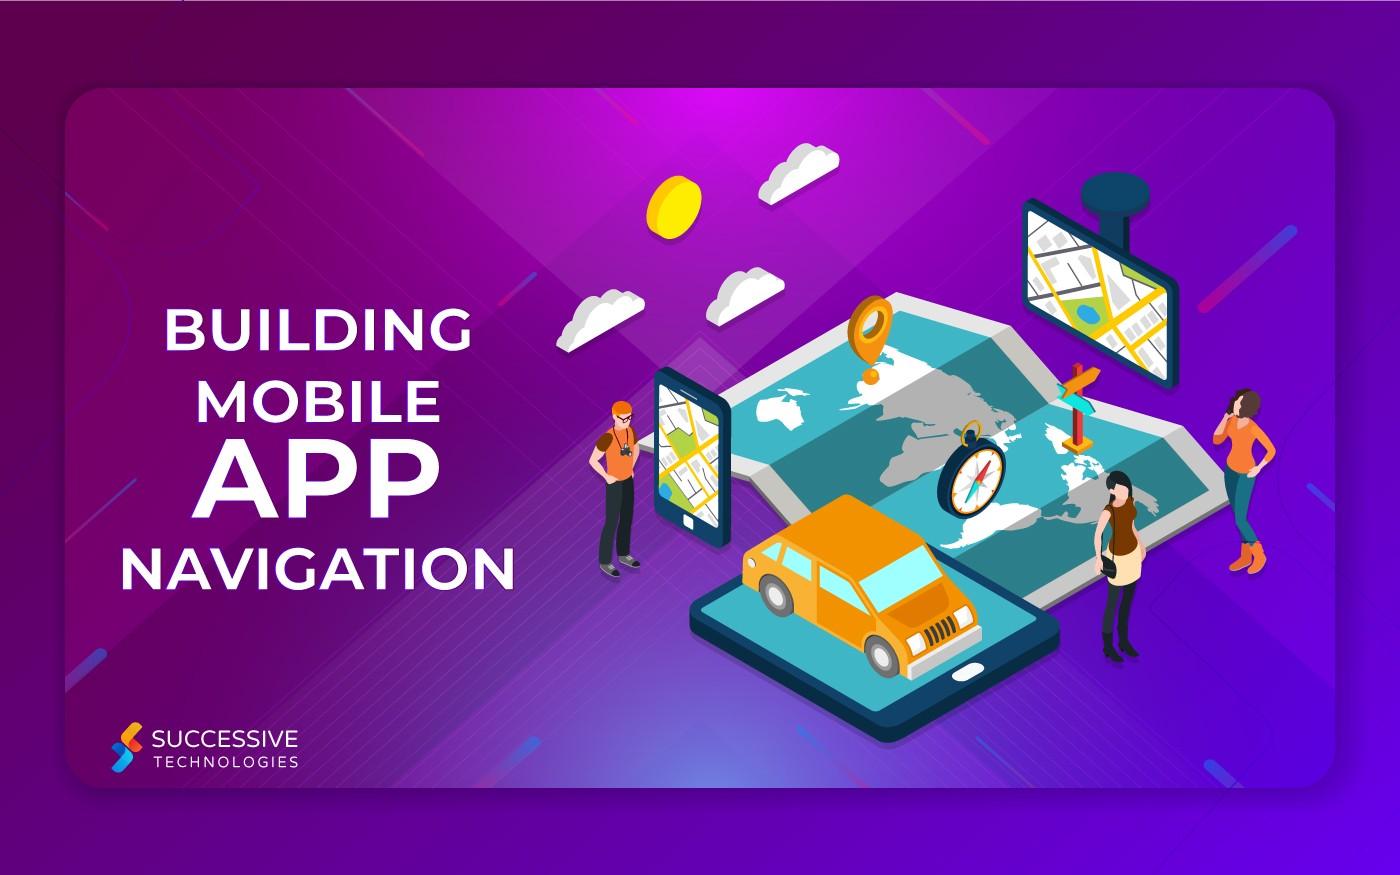 Mobile app nevigation